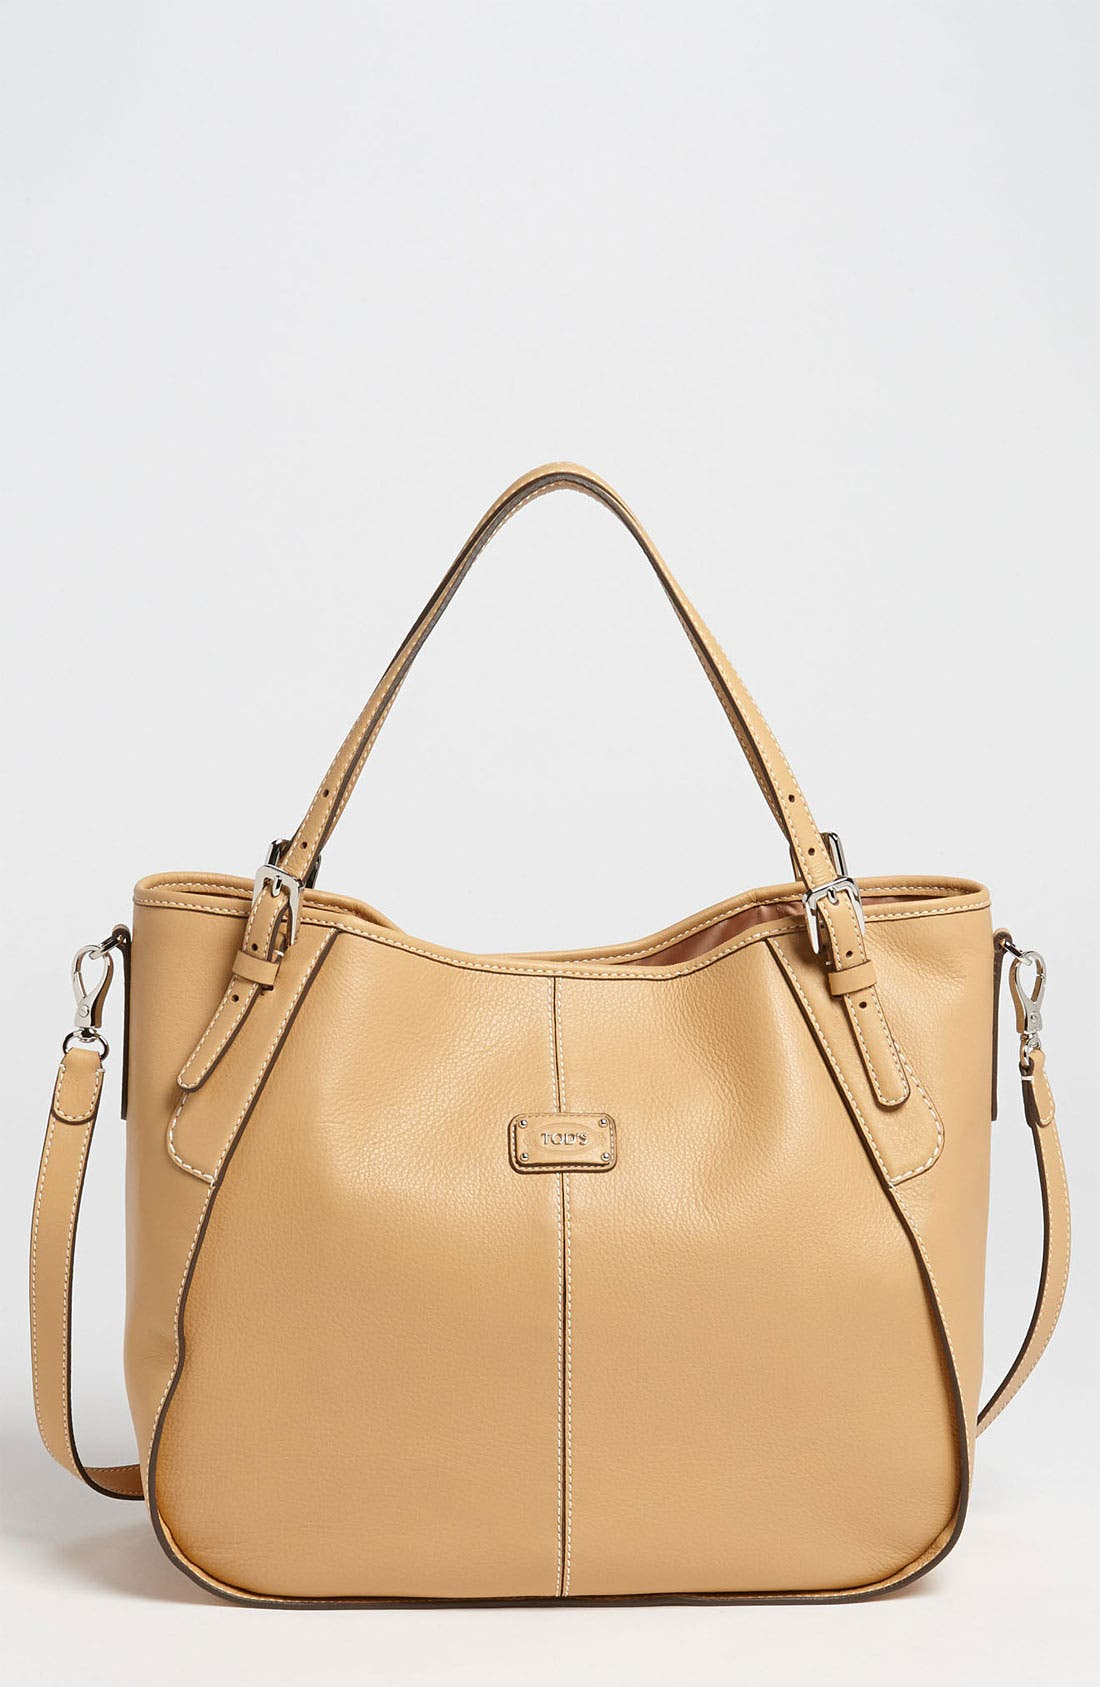 Main Image - Tod's 'New G - Medium' Leather Shoulder Bag